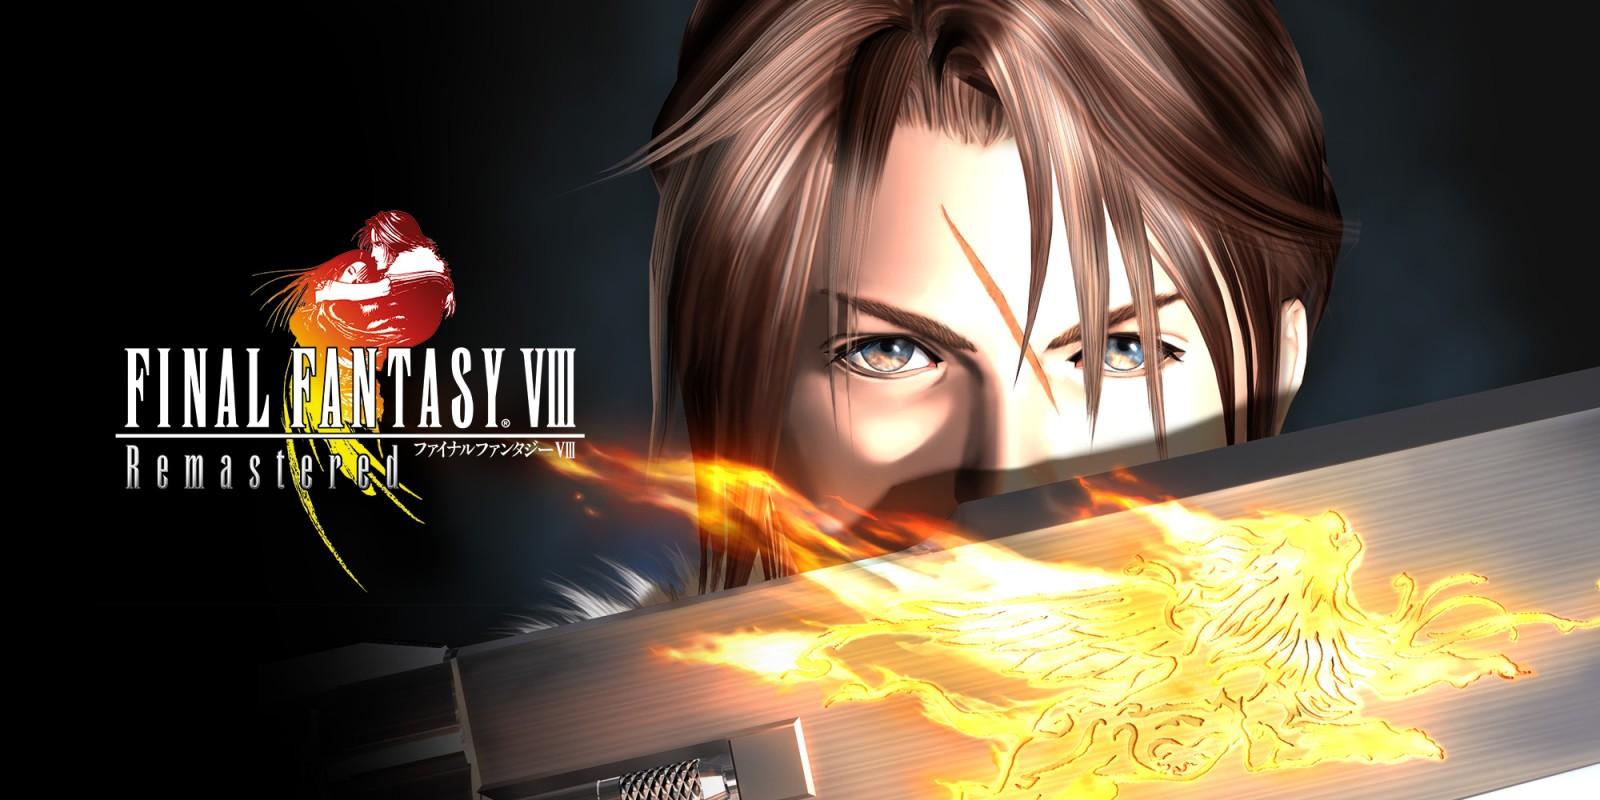 Por dentro de Final Fantasy VIII Remastered